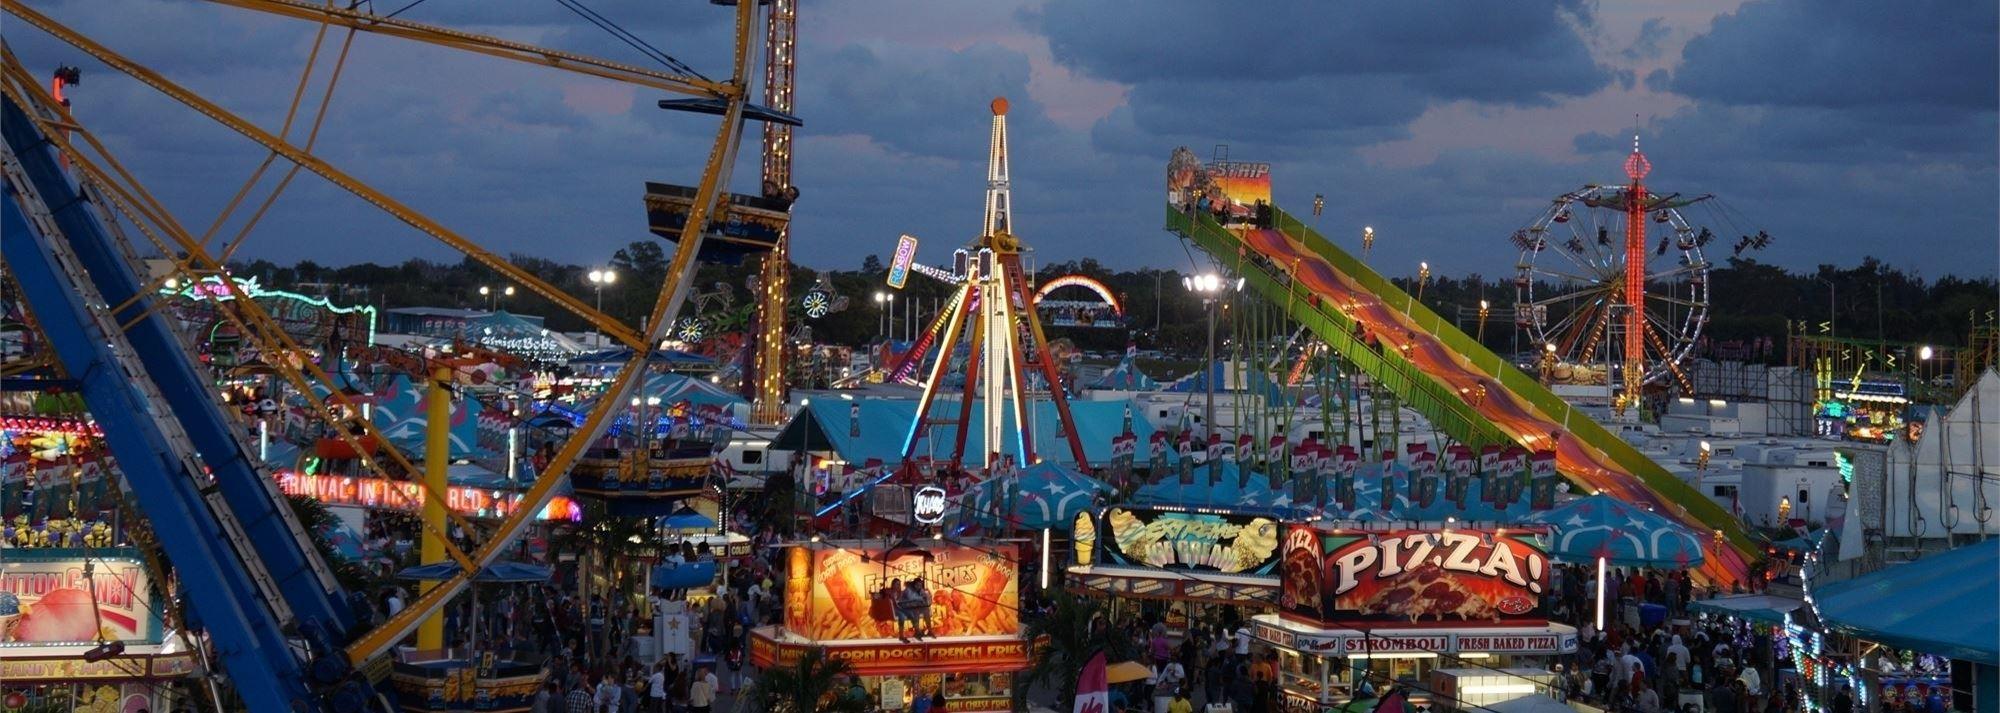 South Florida Fair Tickets Are Available For Pre Sale Now! With Regard To Calendar South Florida Fair